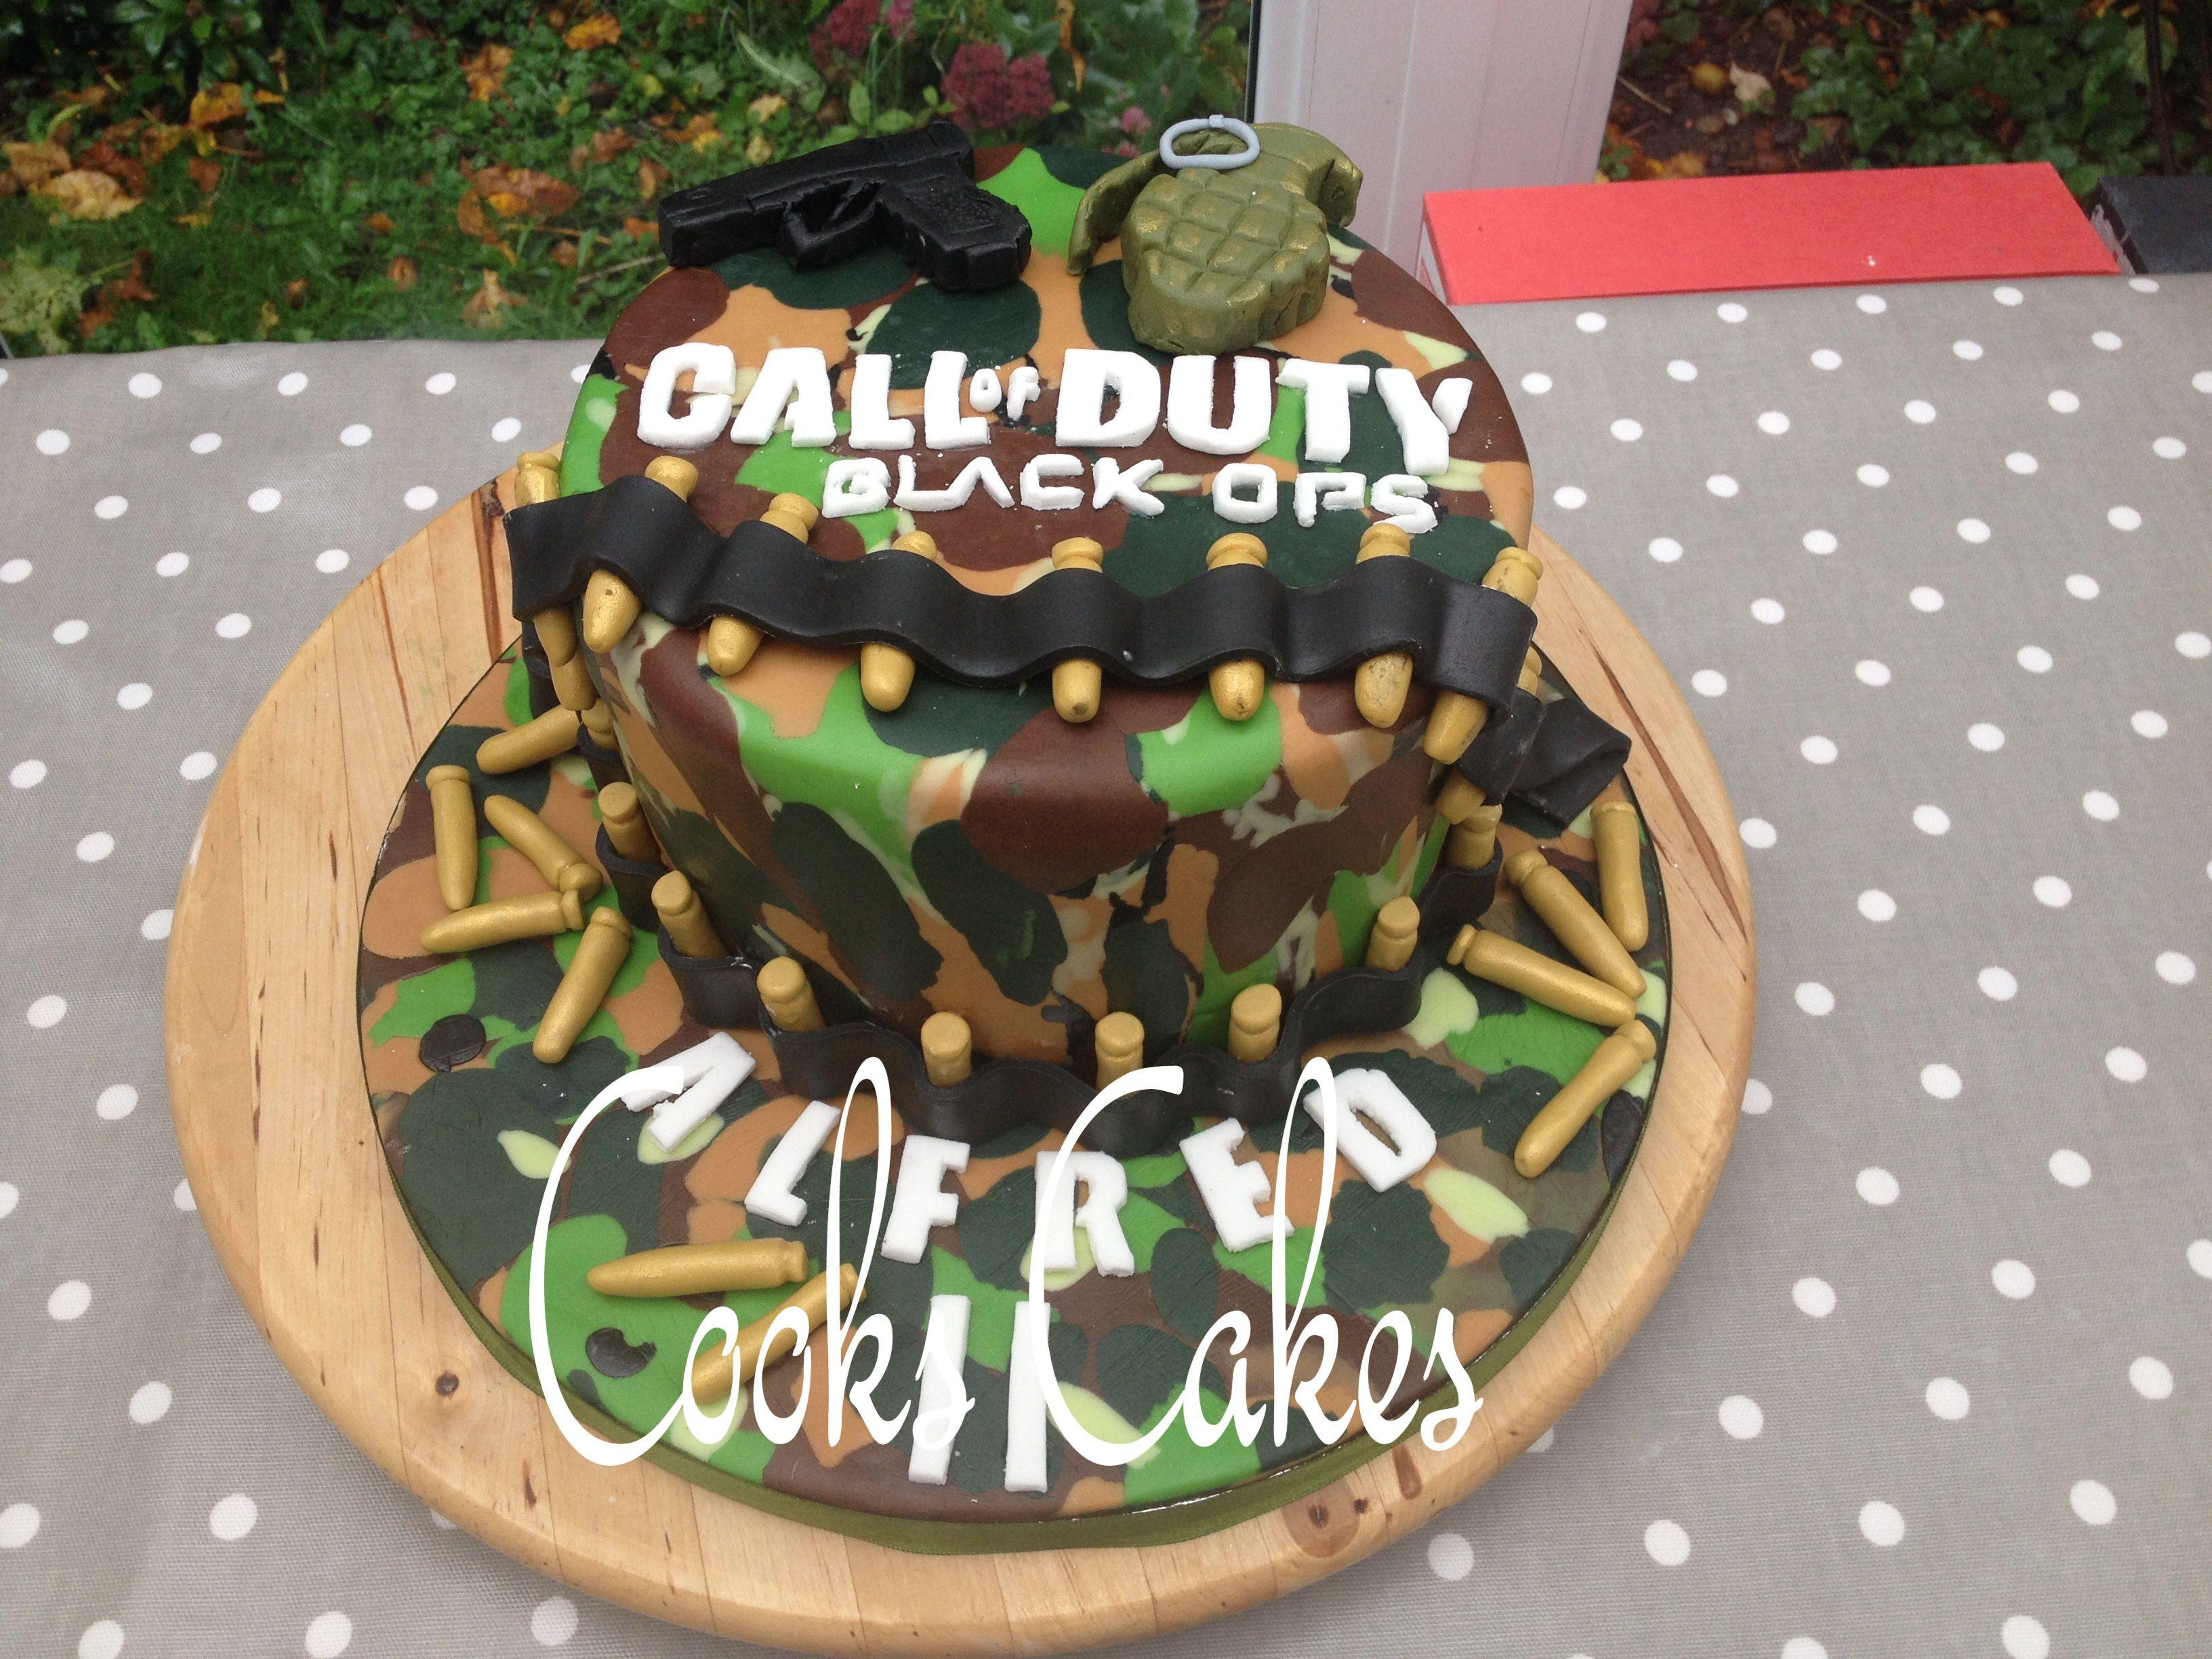 Call of duty cake black ops cake cod cake boys birthday